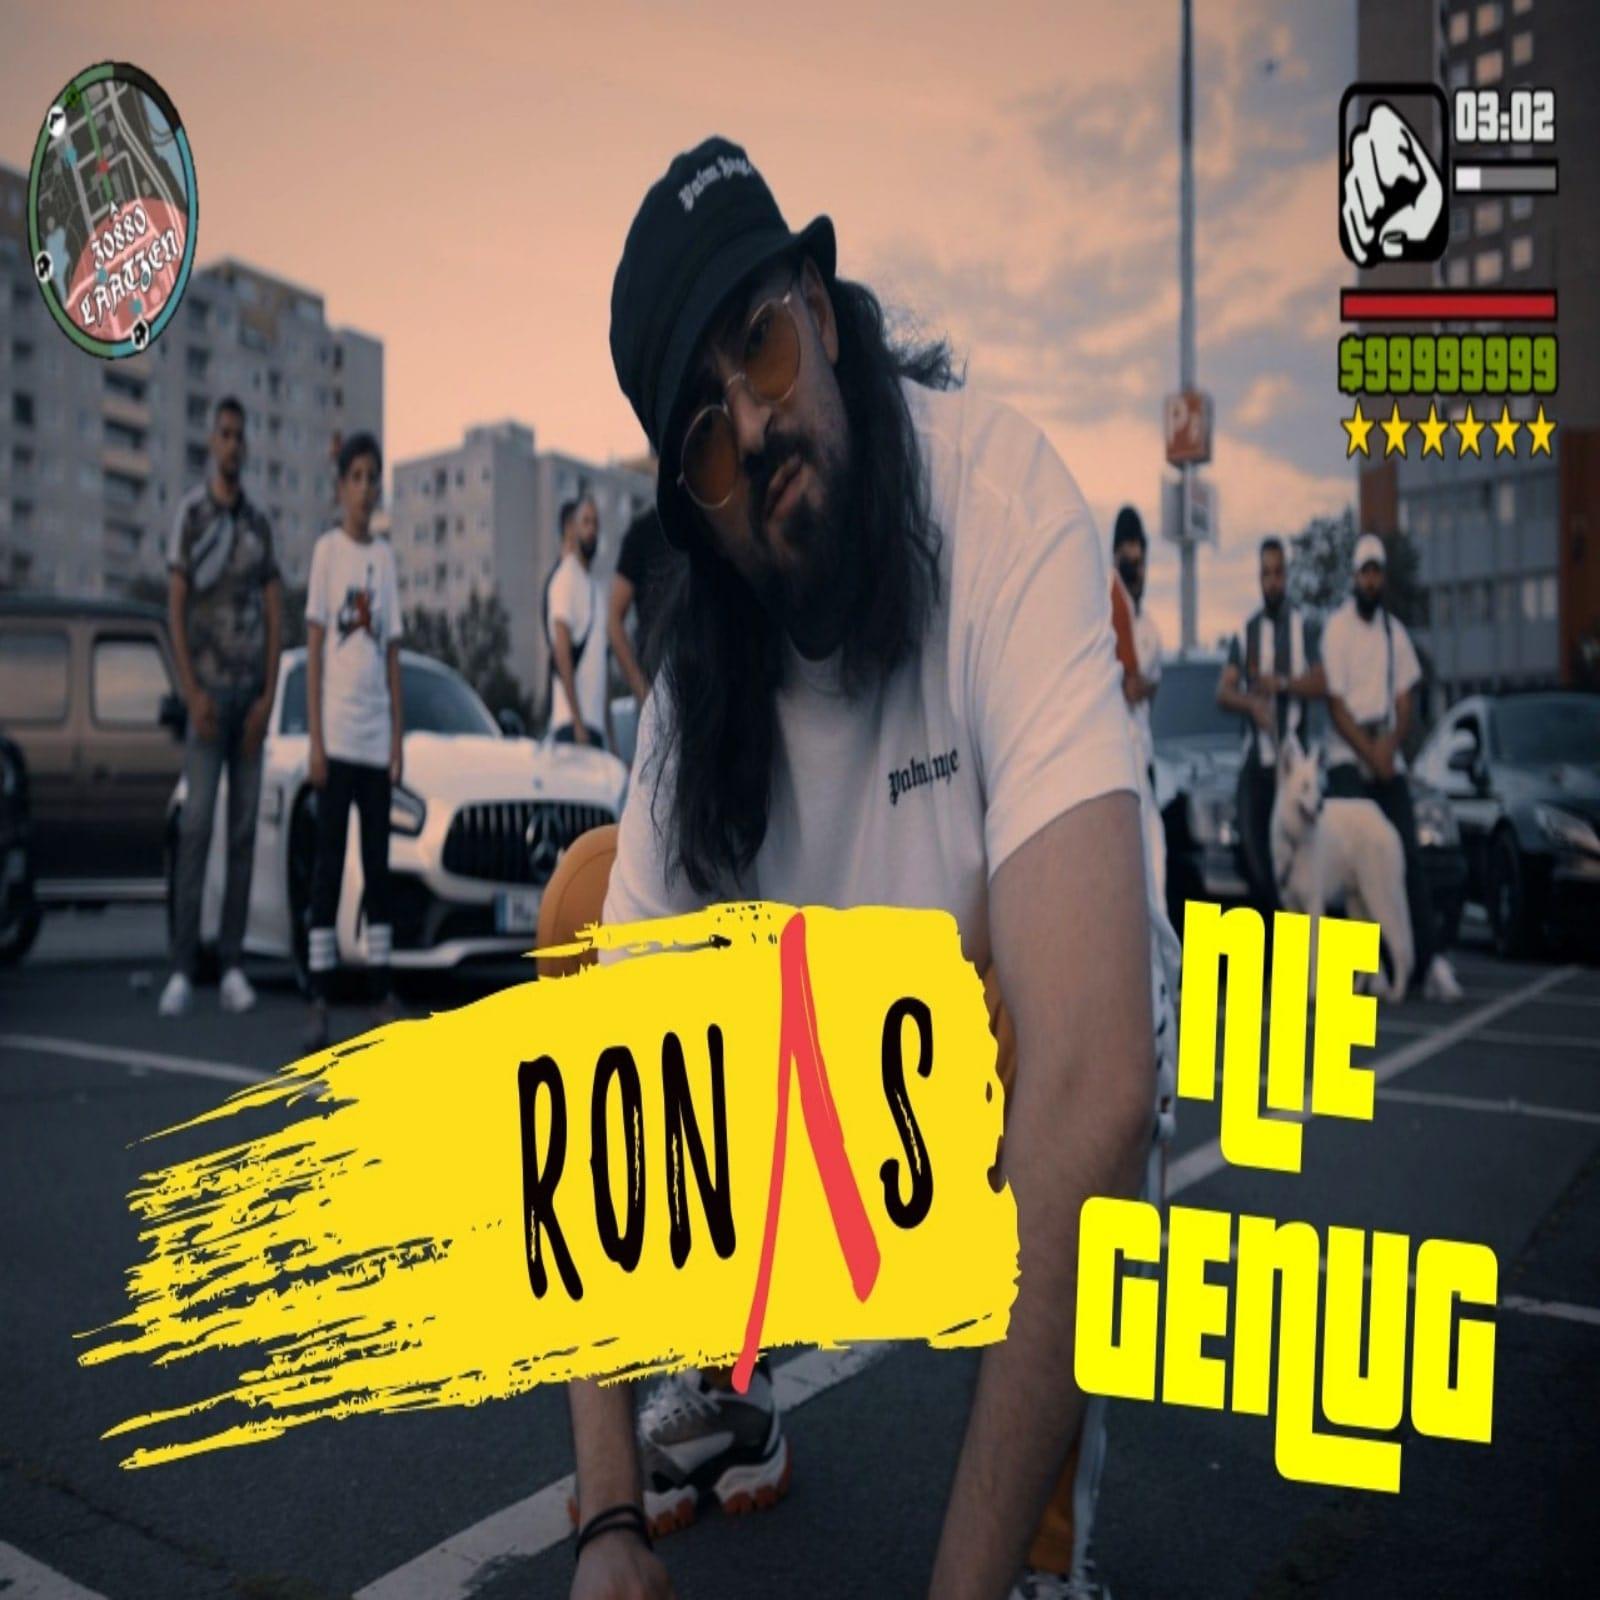 Upcoming: Ronas - Nie Genug